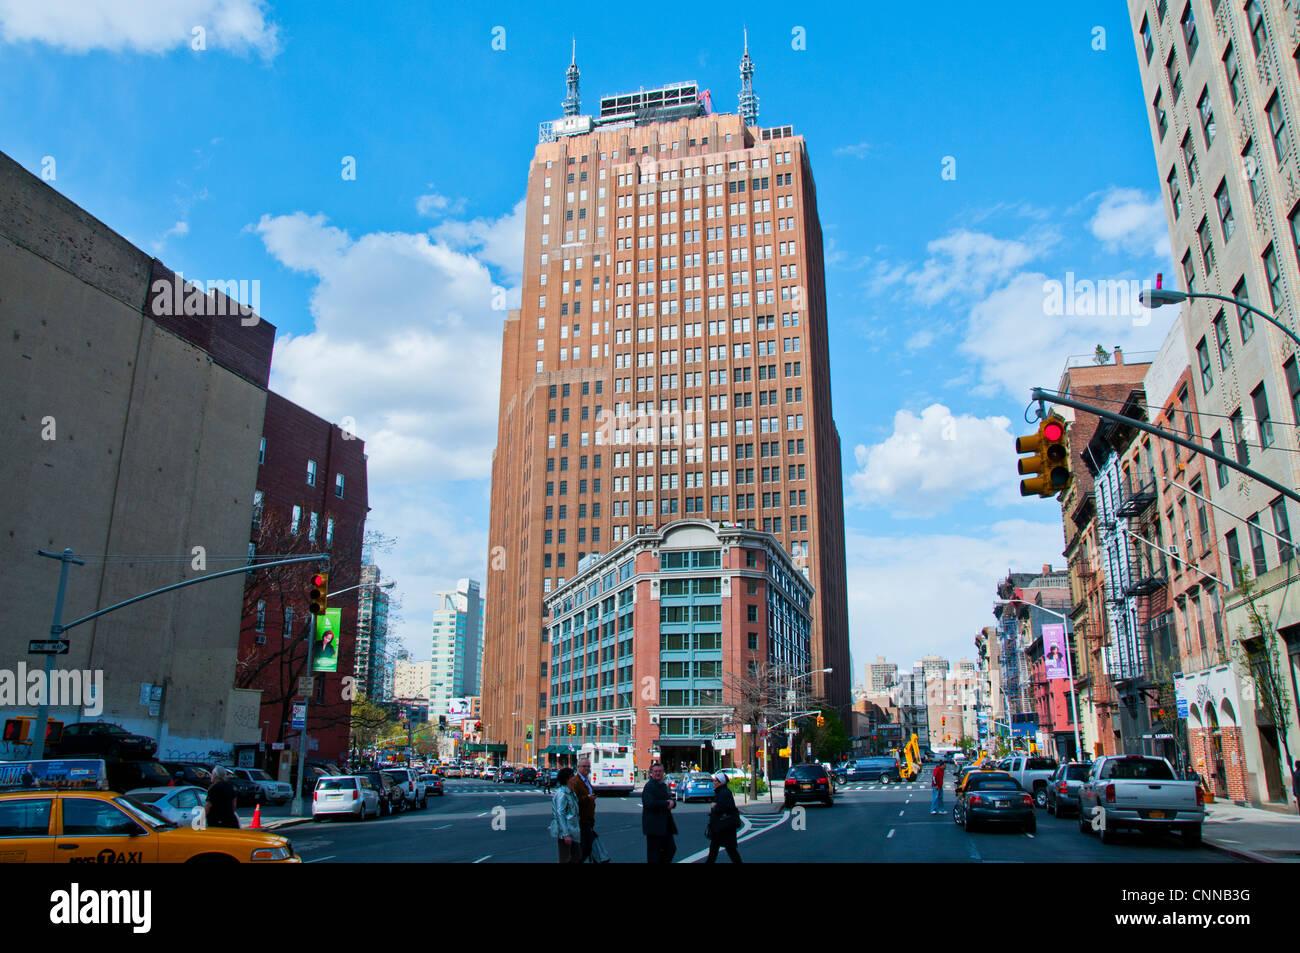 New York City buildings high rises - Stock Image